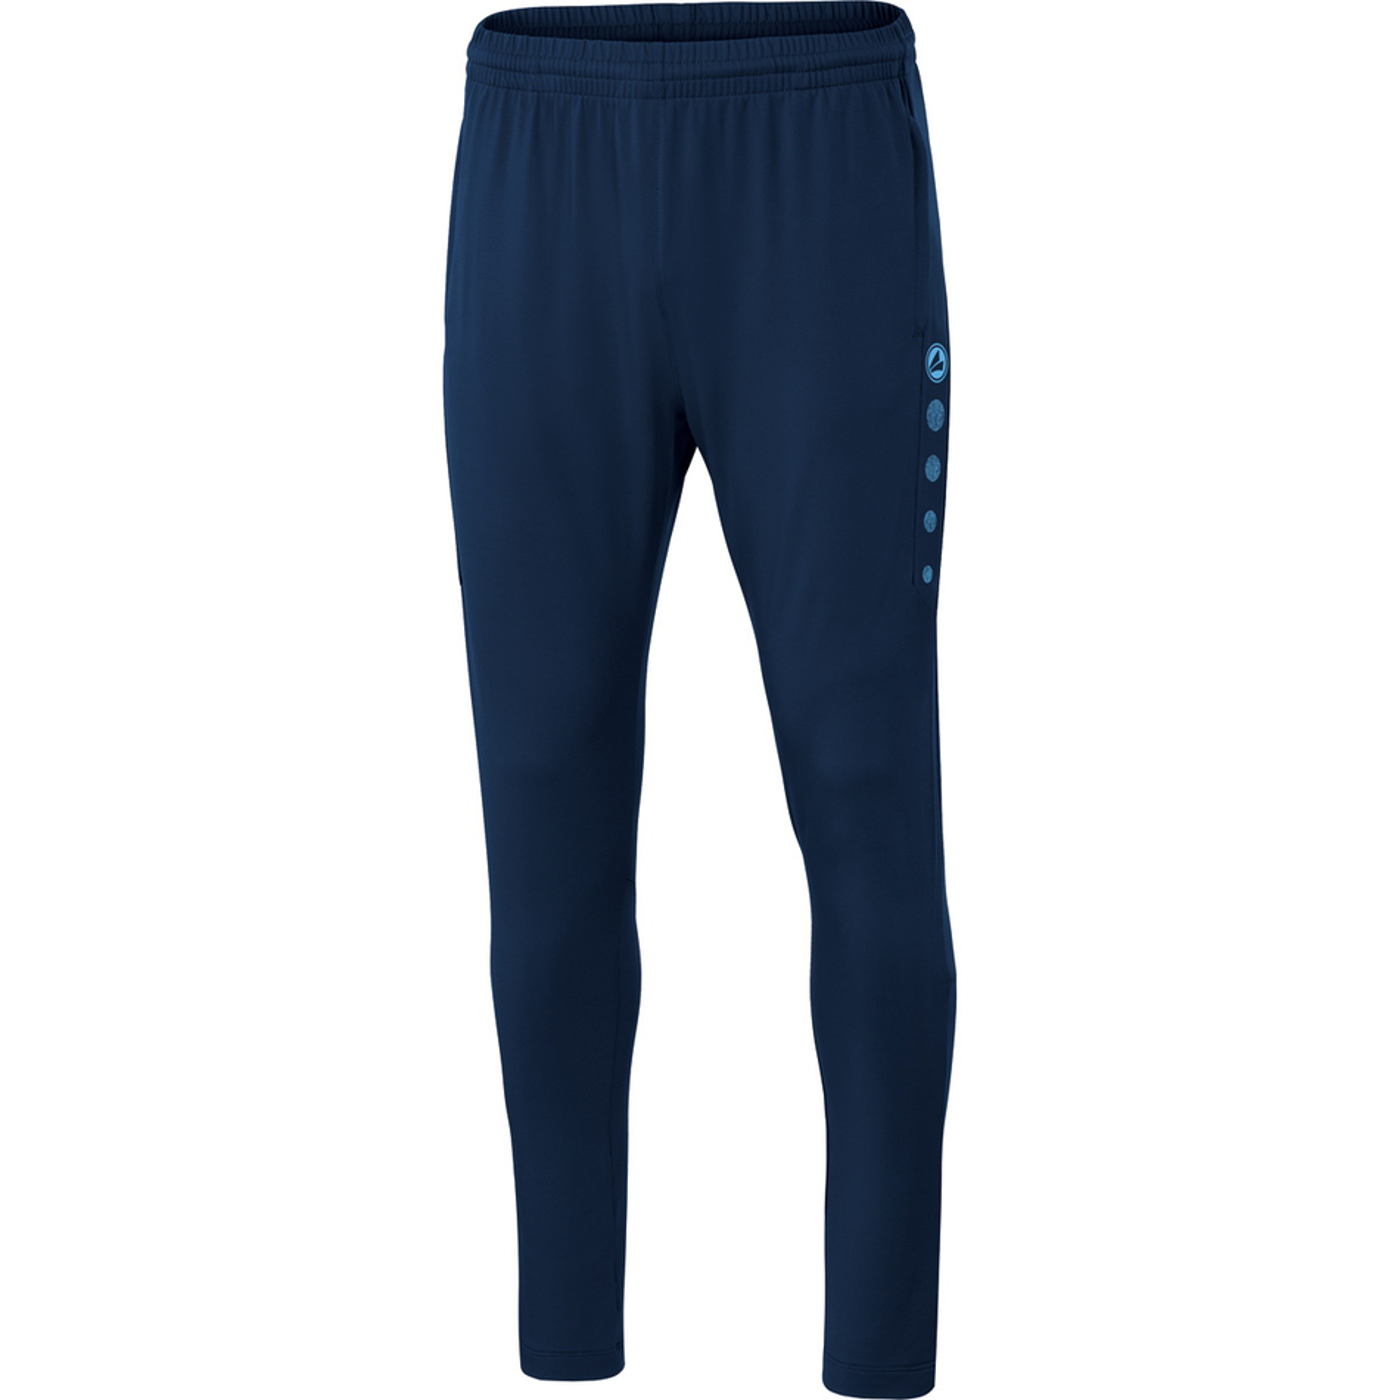 Jako Trainingshose Premium Damen - blau - Größe 42